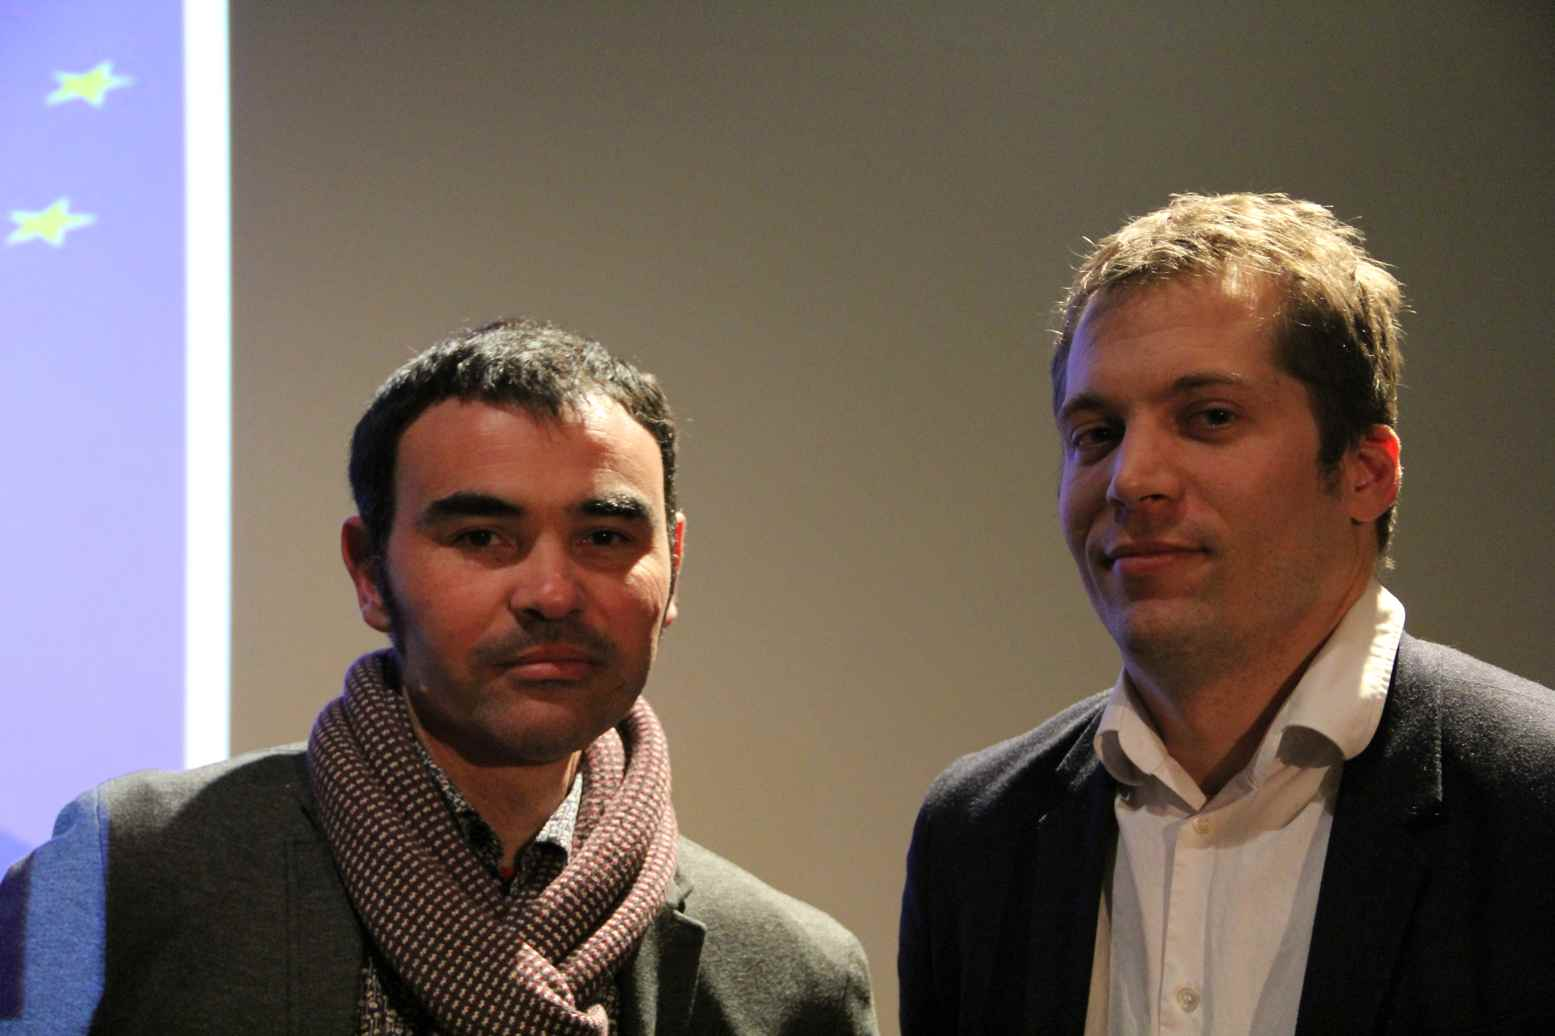 "Von links: Gilles Rof, Regisseur des Films ""Les Rebelles du Foot"" und Florian Fangmann, Geschäfstführer des Centre. Foto: Andrei Schnell"